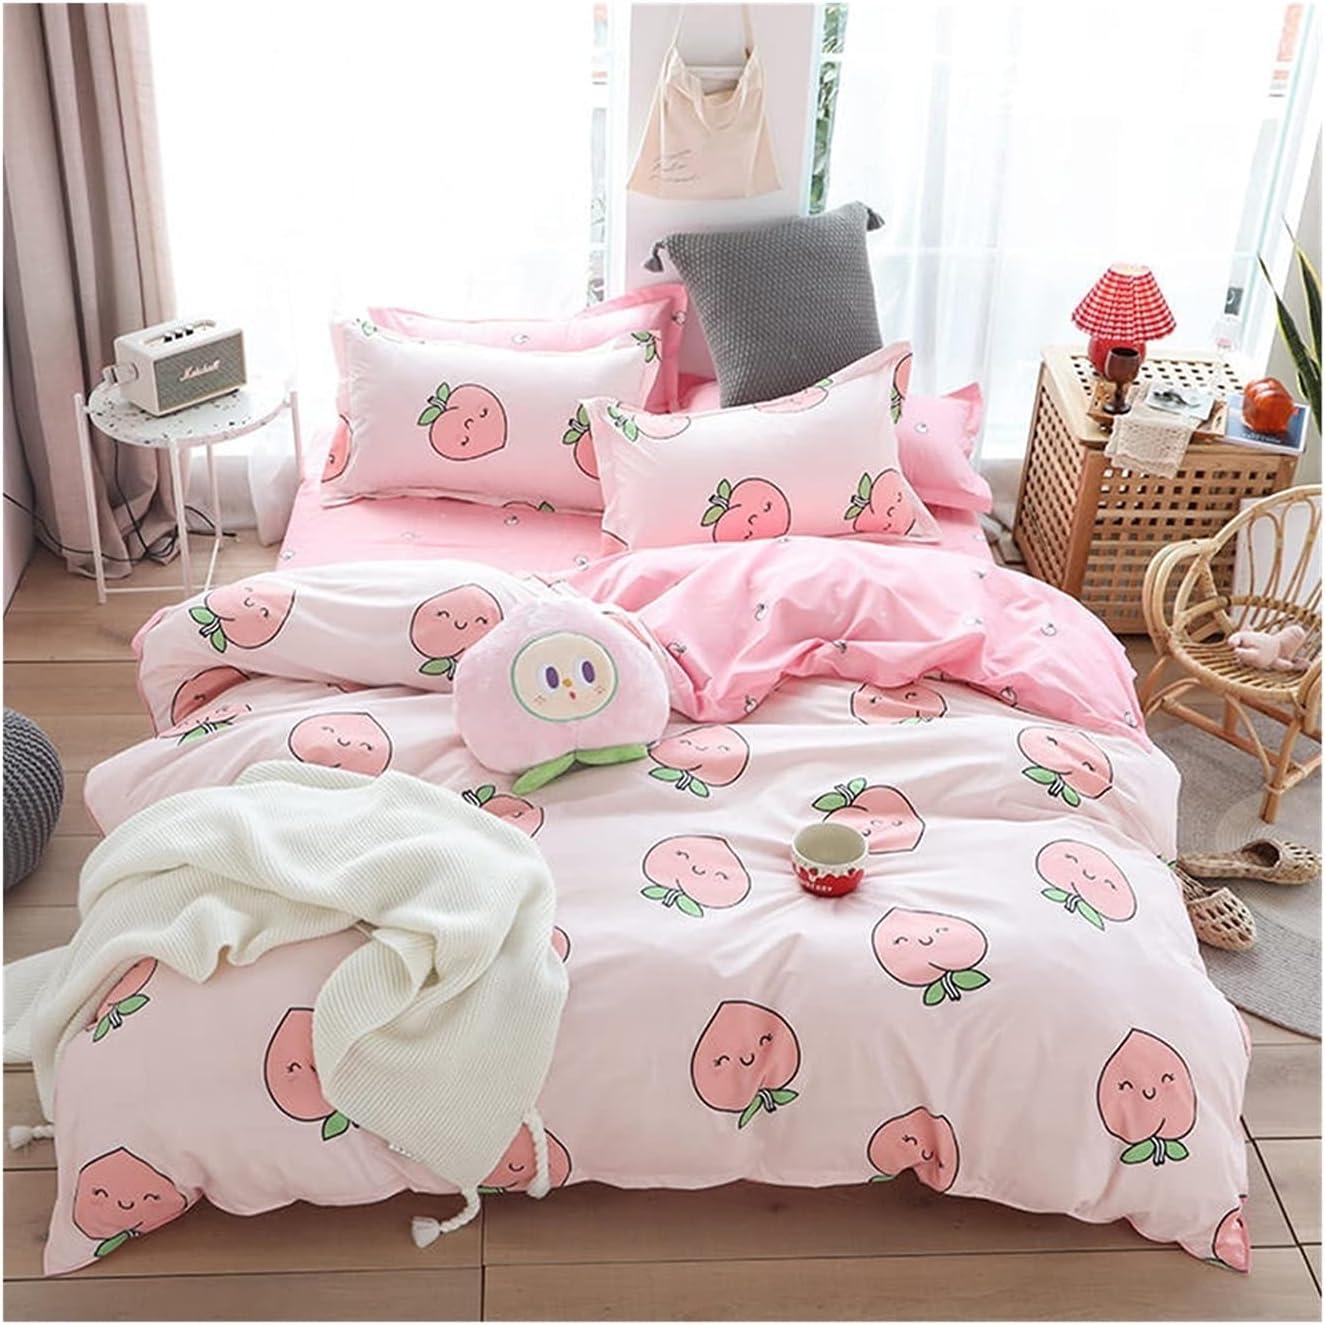 Max 78% OFF LSDJ QMDSH Home Textile Baltimore Mall Girl Bedding Pink Duvet Set Peach Cover